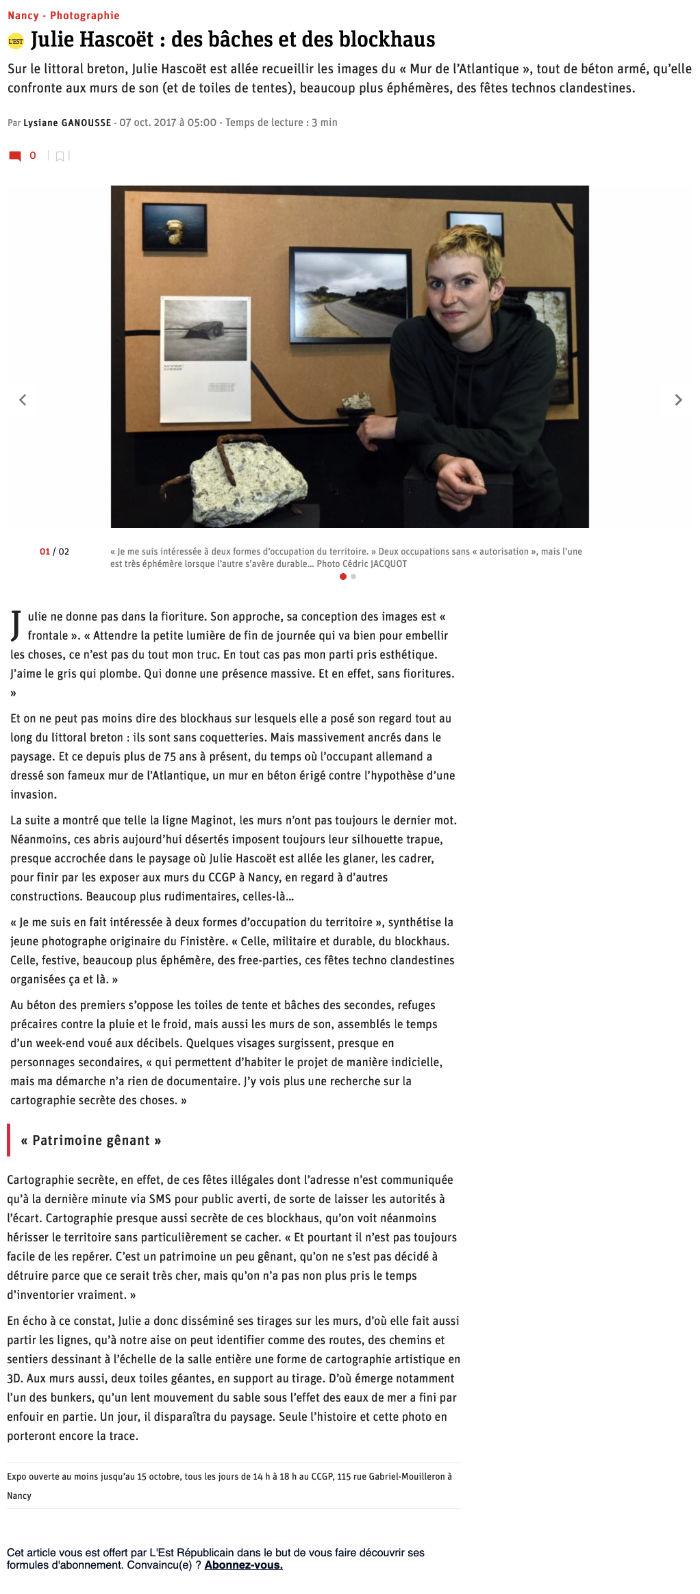 julie-hascoet-est-repu